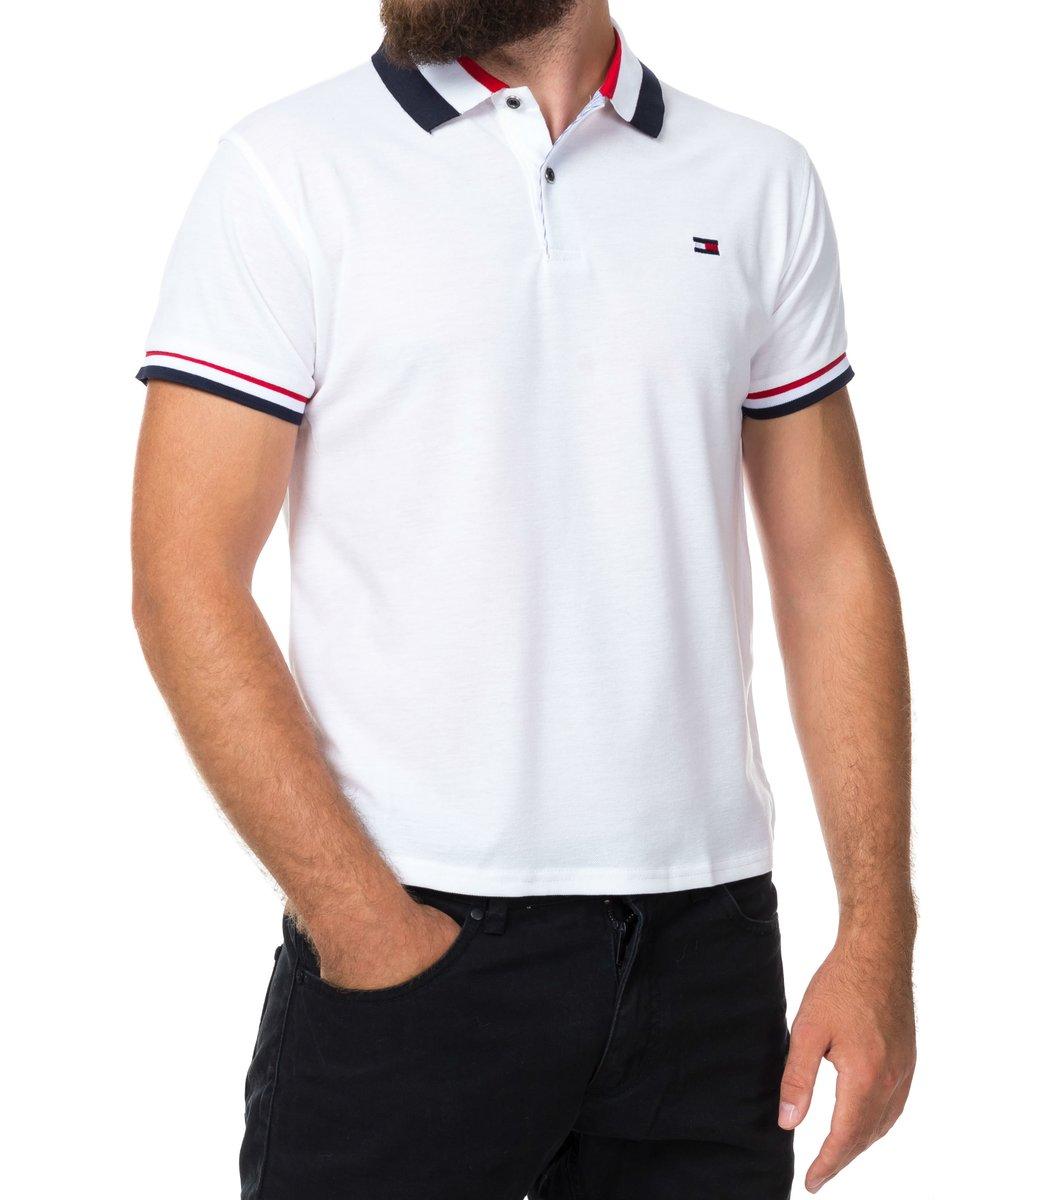 Мужская белая футболка поло Tommy Hilfiger